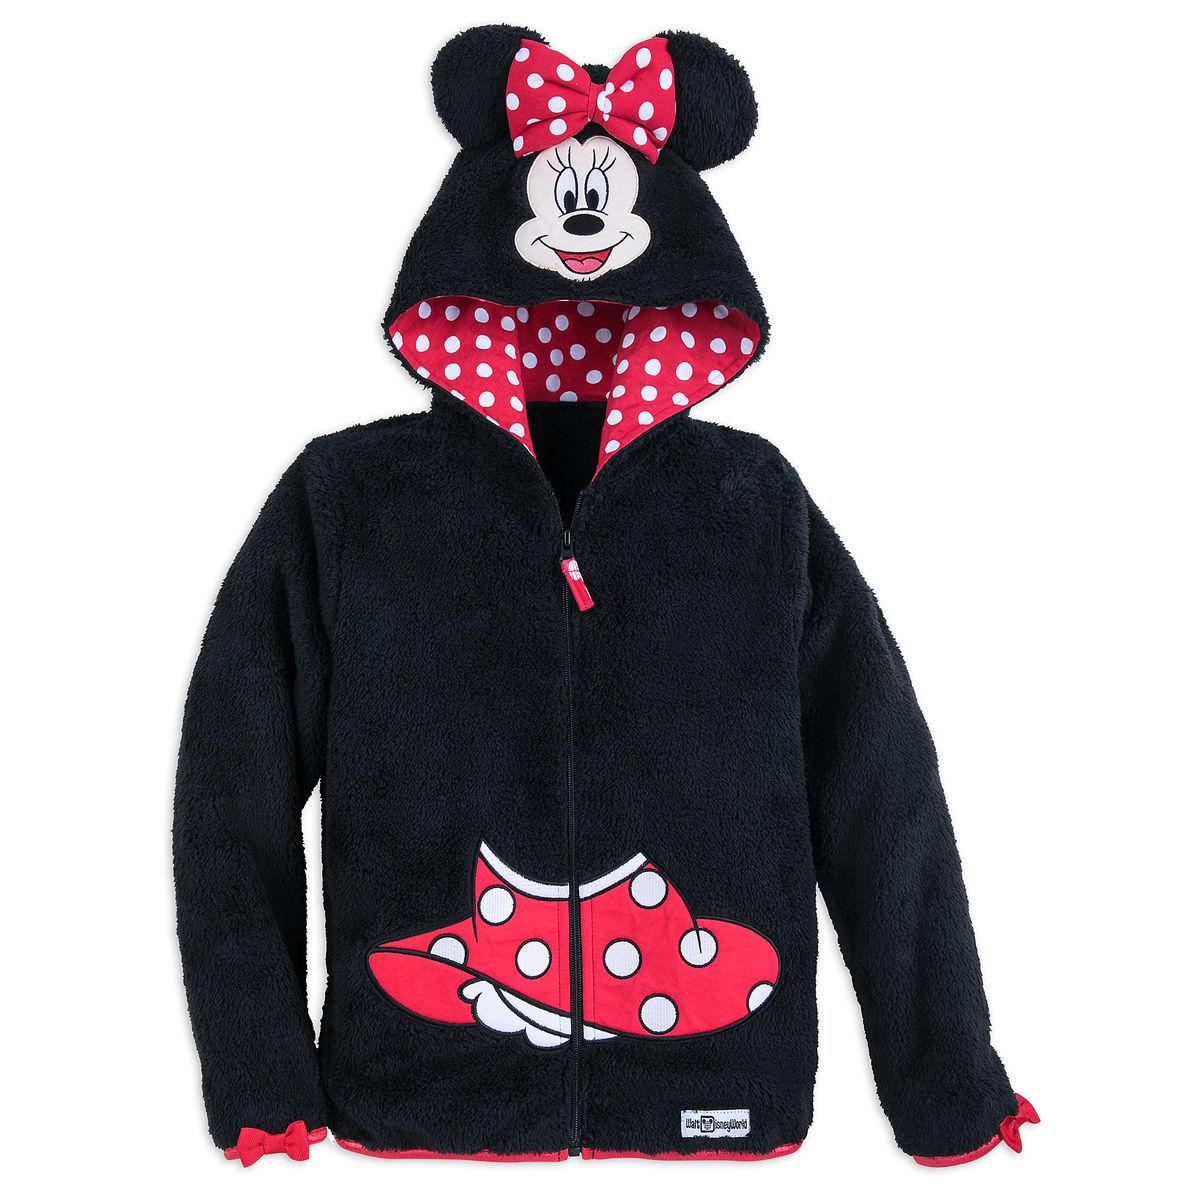 1c45253888cb Disney Girl s Hoodie - Minnie Mouse Hooded Fleece Jacket for Girls